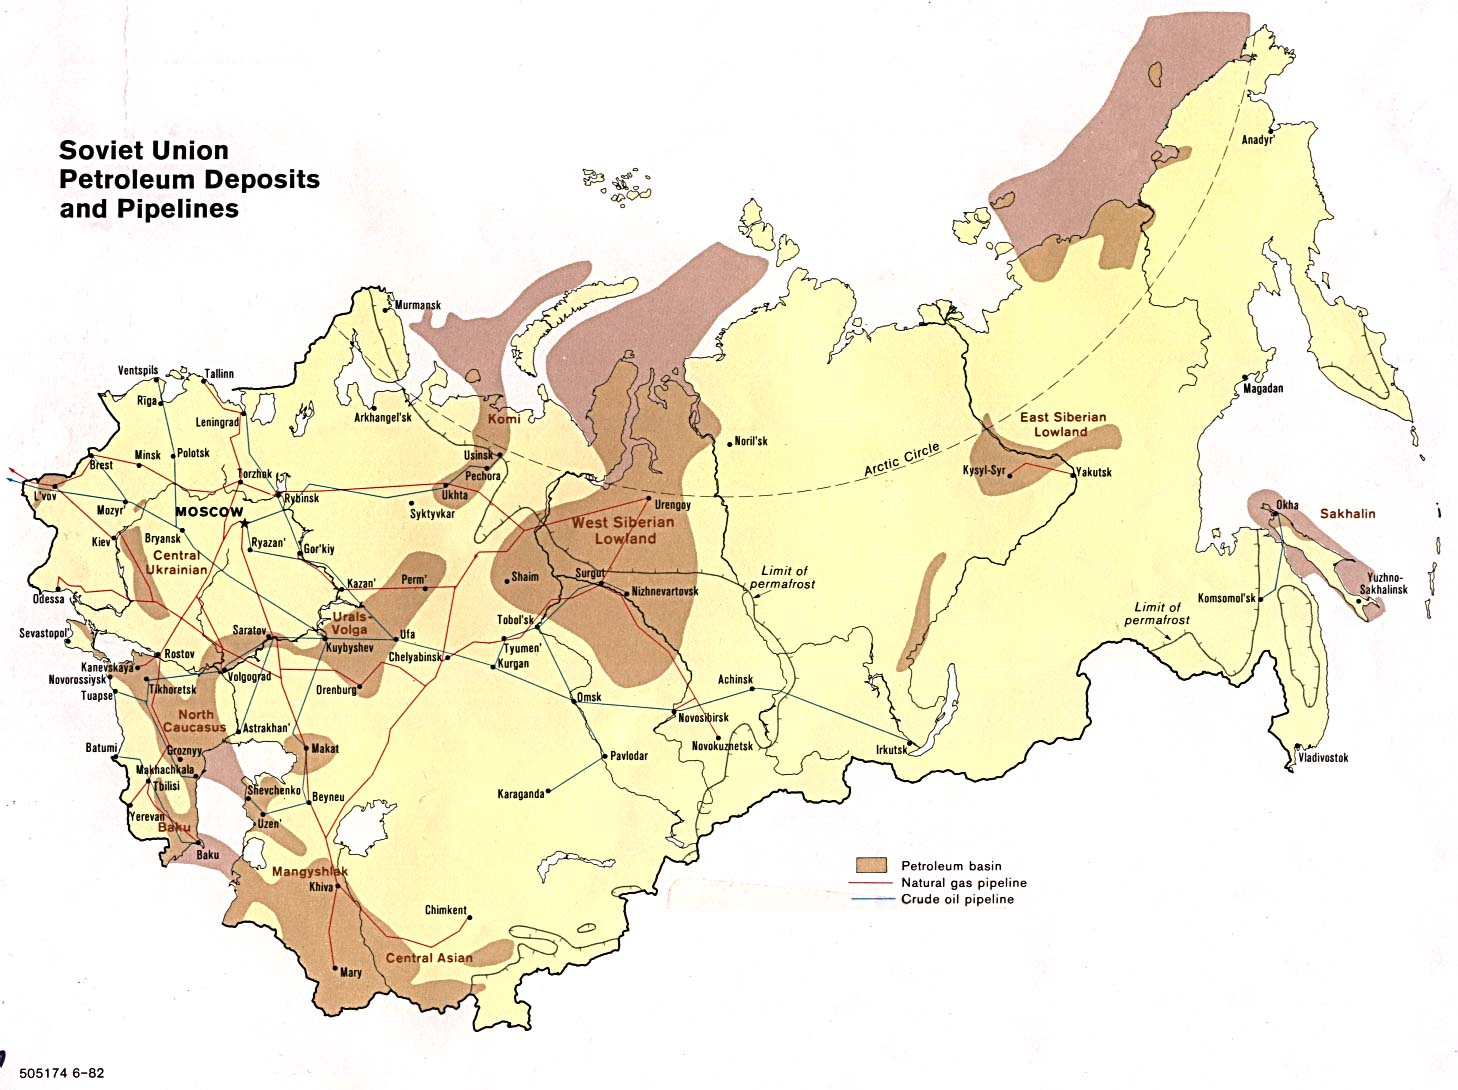 Picture of: Federacion Rusa Yacimientos De Petroleo Http Www Lib Utexas Edu Maps Commonwealth Soviet Pet Deposit 82 Jpg